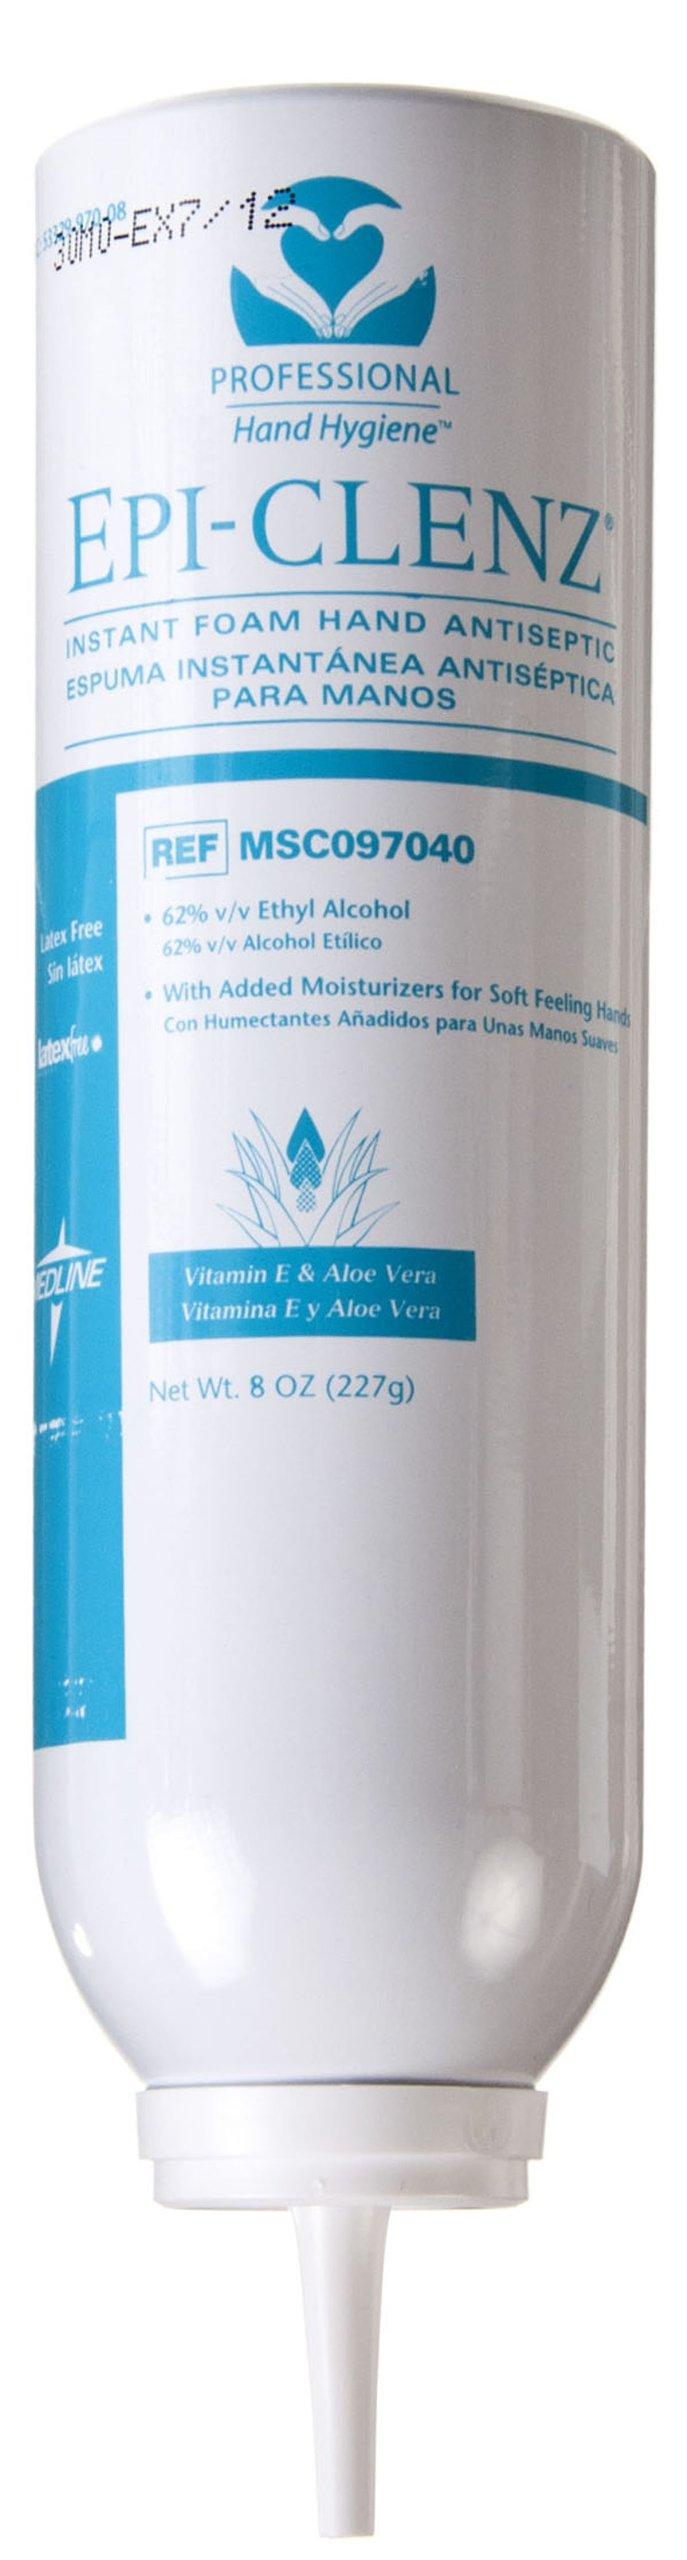 Medline MSC097040 Epi-Clenz Foaming Instant Hand Sanitizers, Latex Free, 8 oz, Clear (Pack of 24)